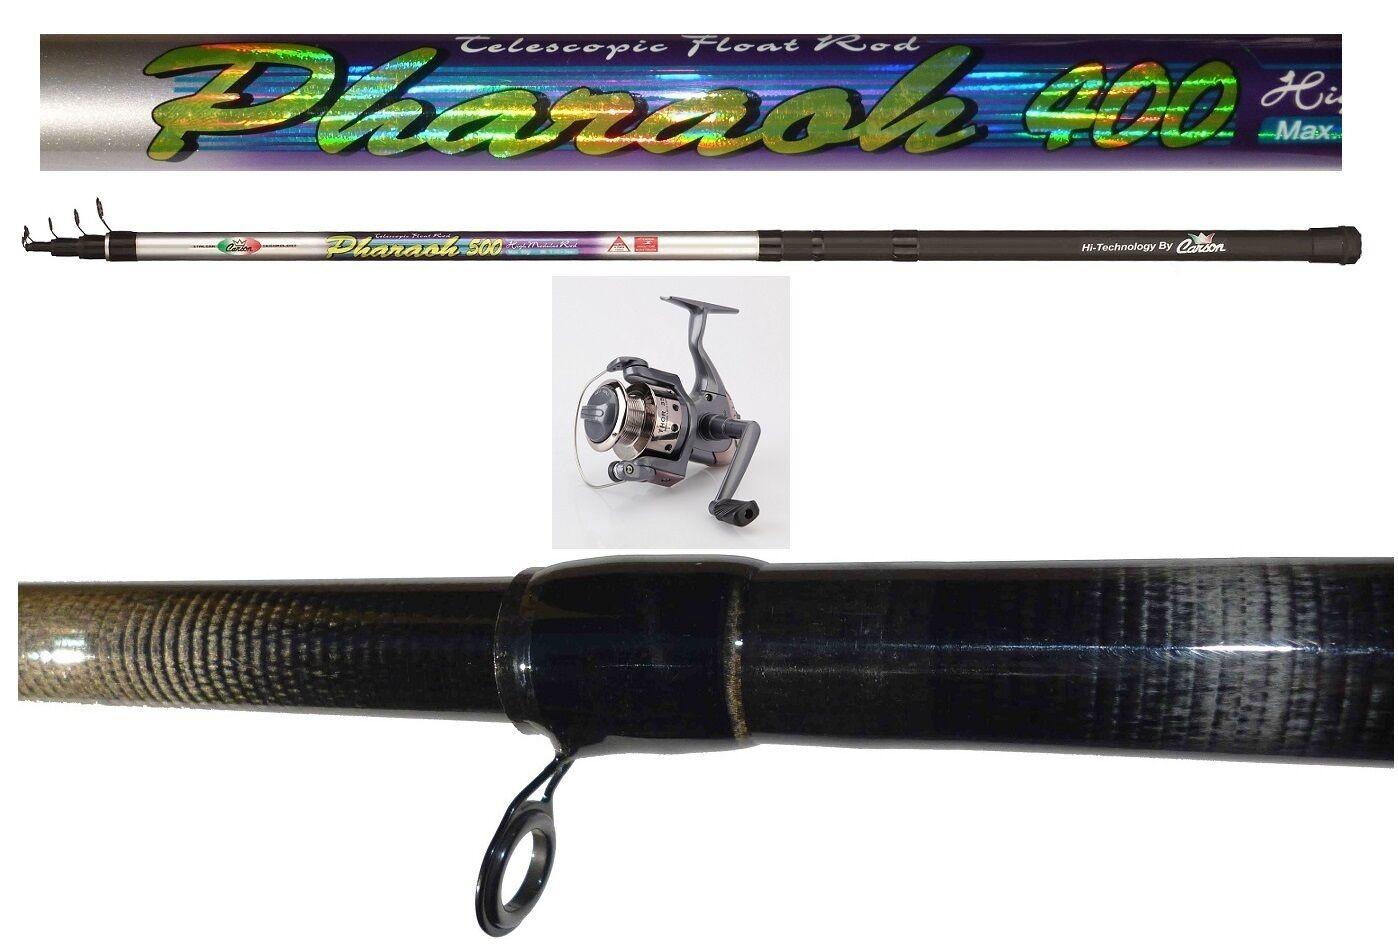 Kit canna pharaoh 4mt + mulinello thor 2000 pesca trota galleggiante carbonio